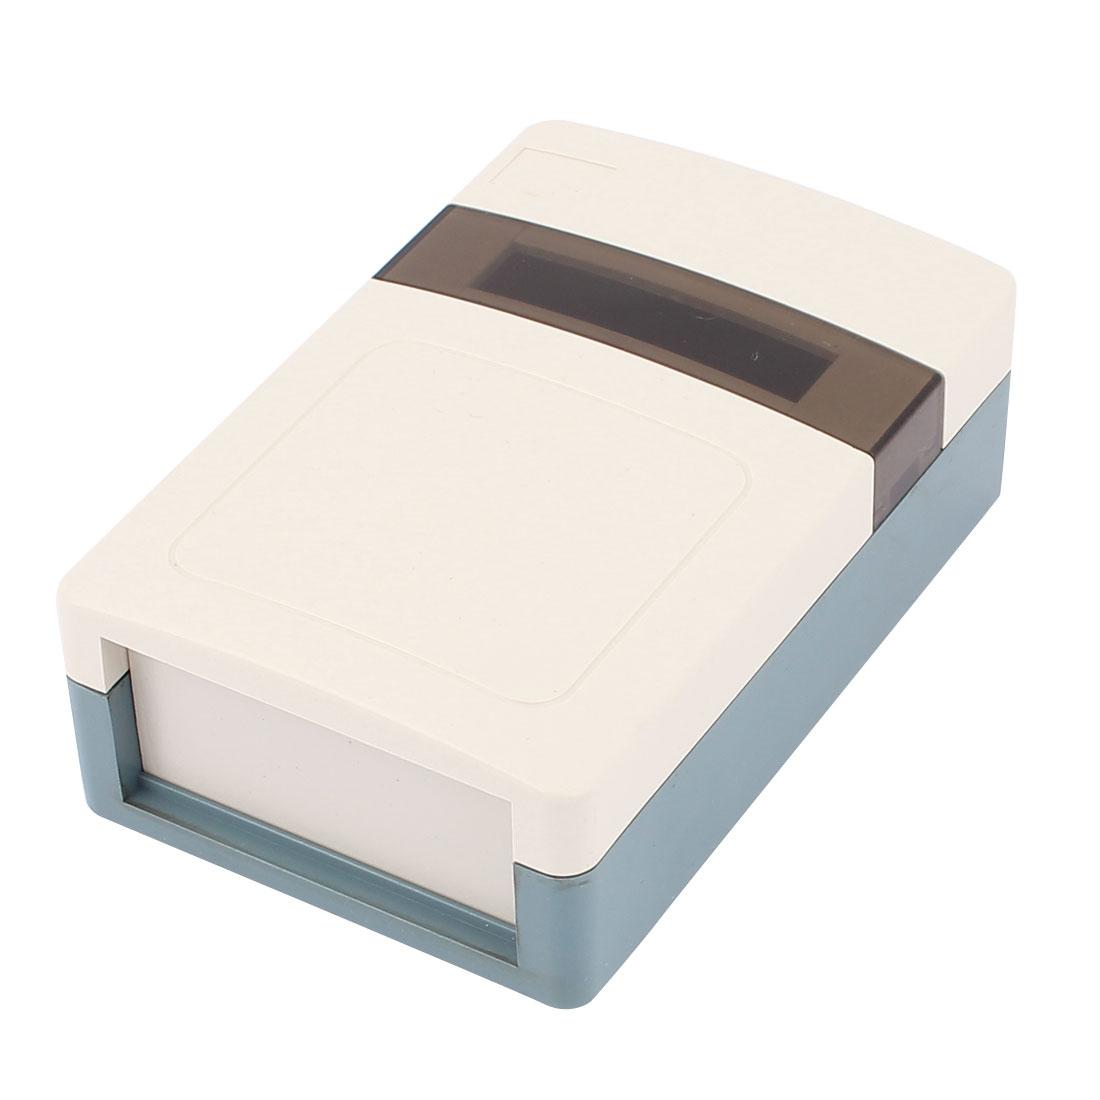 120mm x 78mm x 40mm Rectangular Plastic Enclosure Case DIY Junction Box